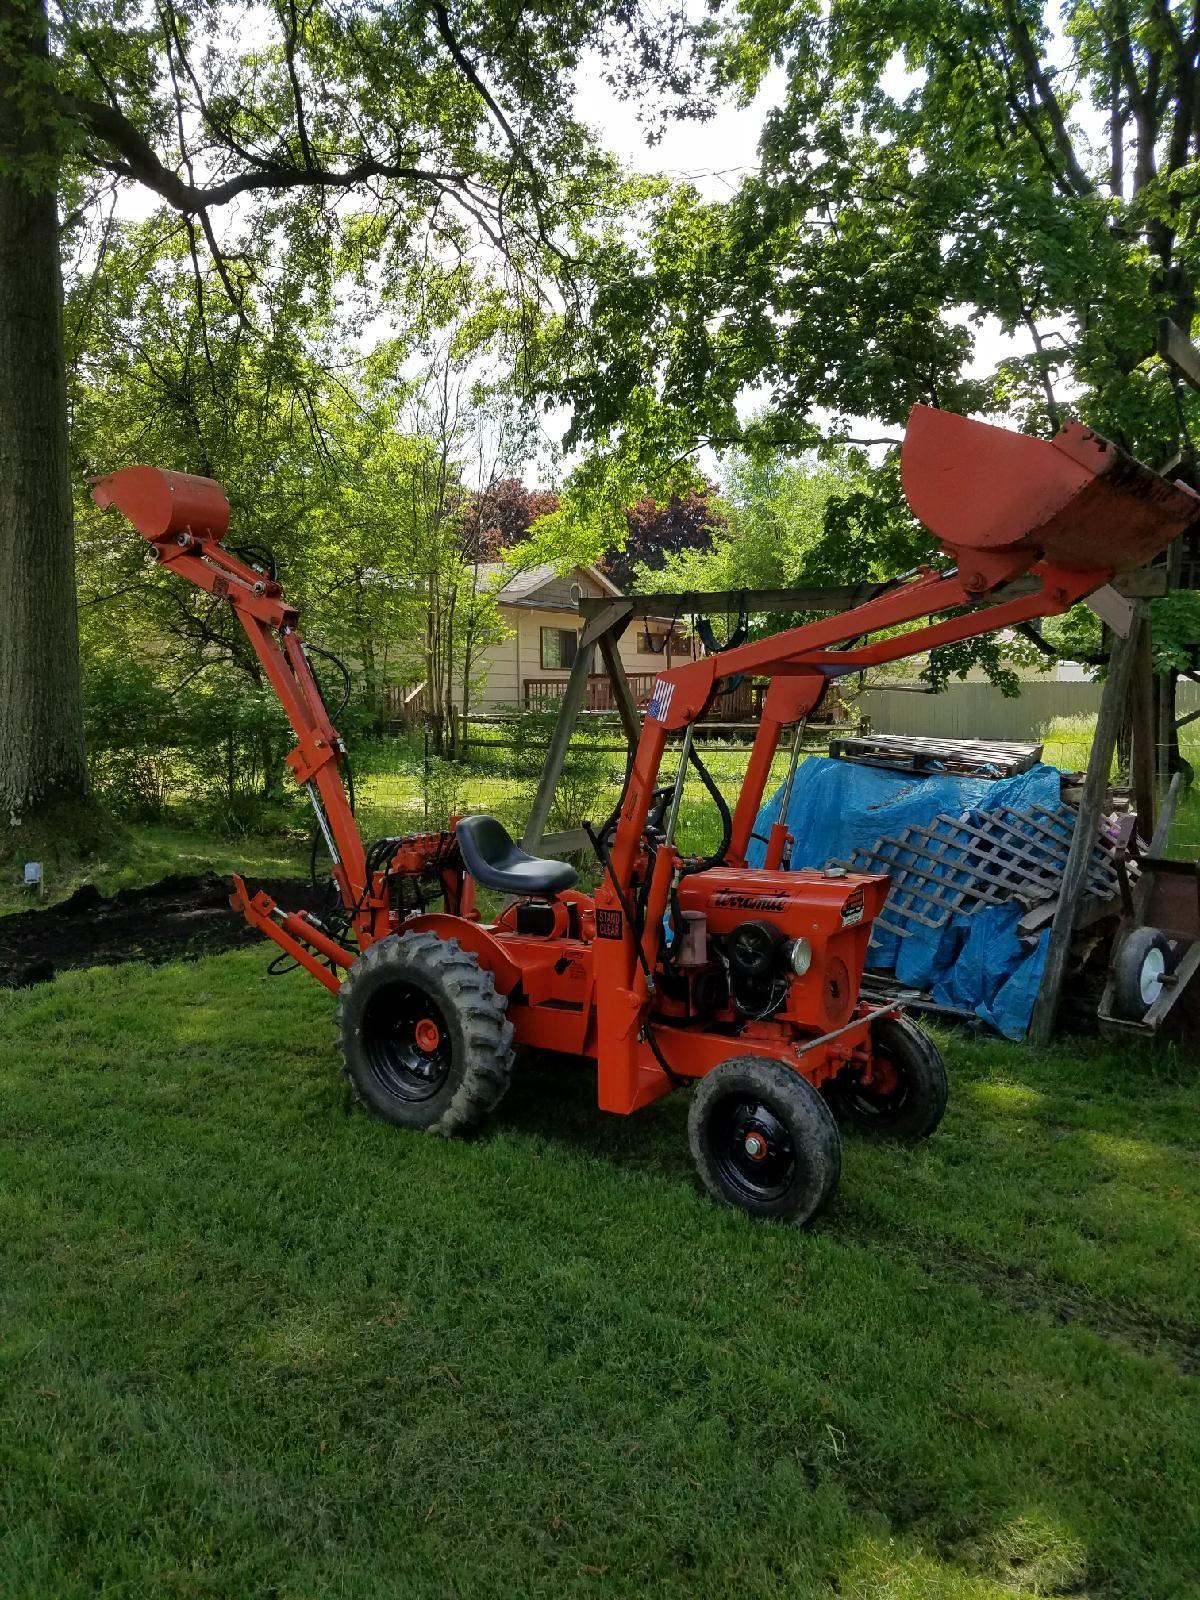 1971 terramite economy tractor model 2 garden tractor. Black Bedroom Furniture Sets. Home Design Ideas